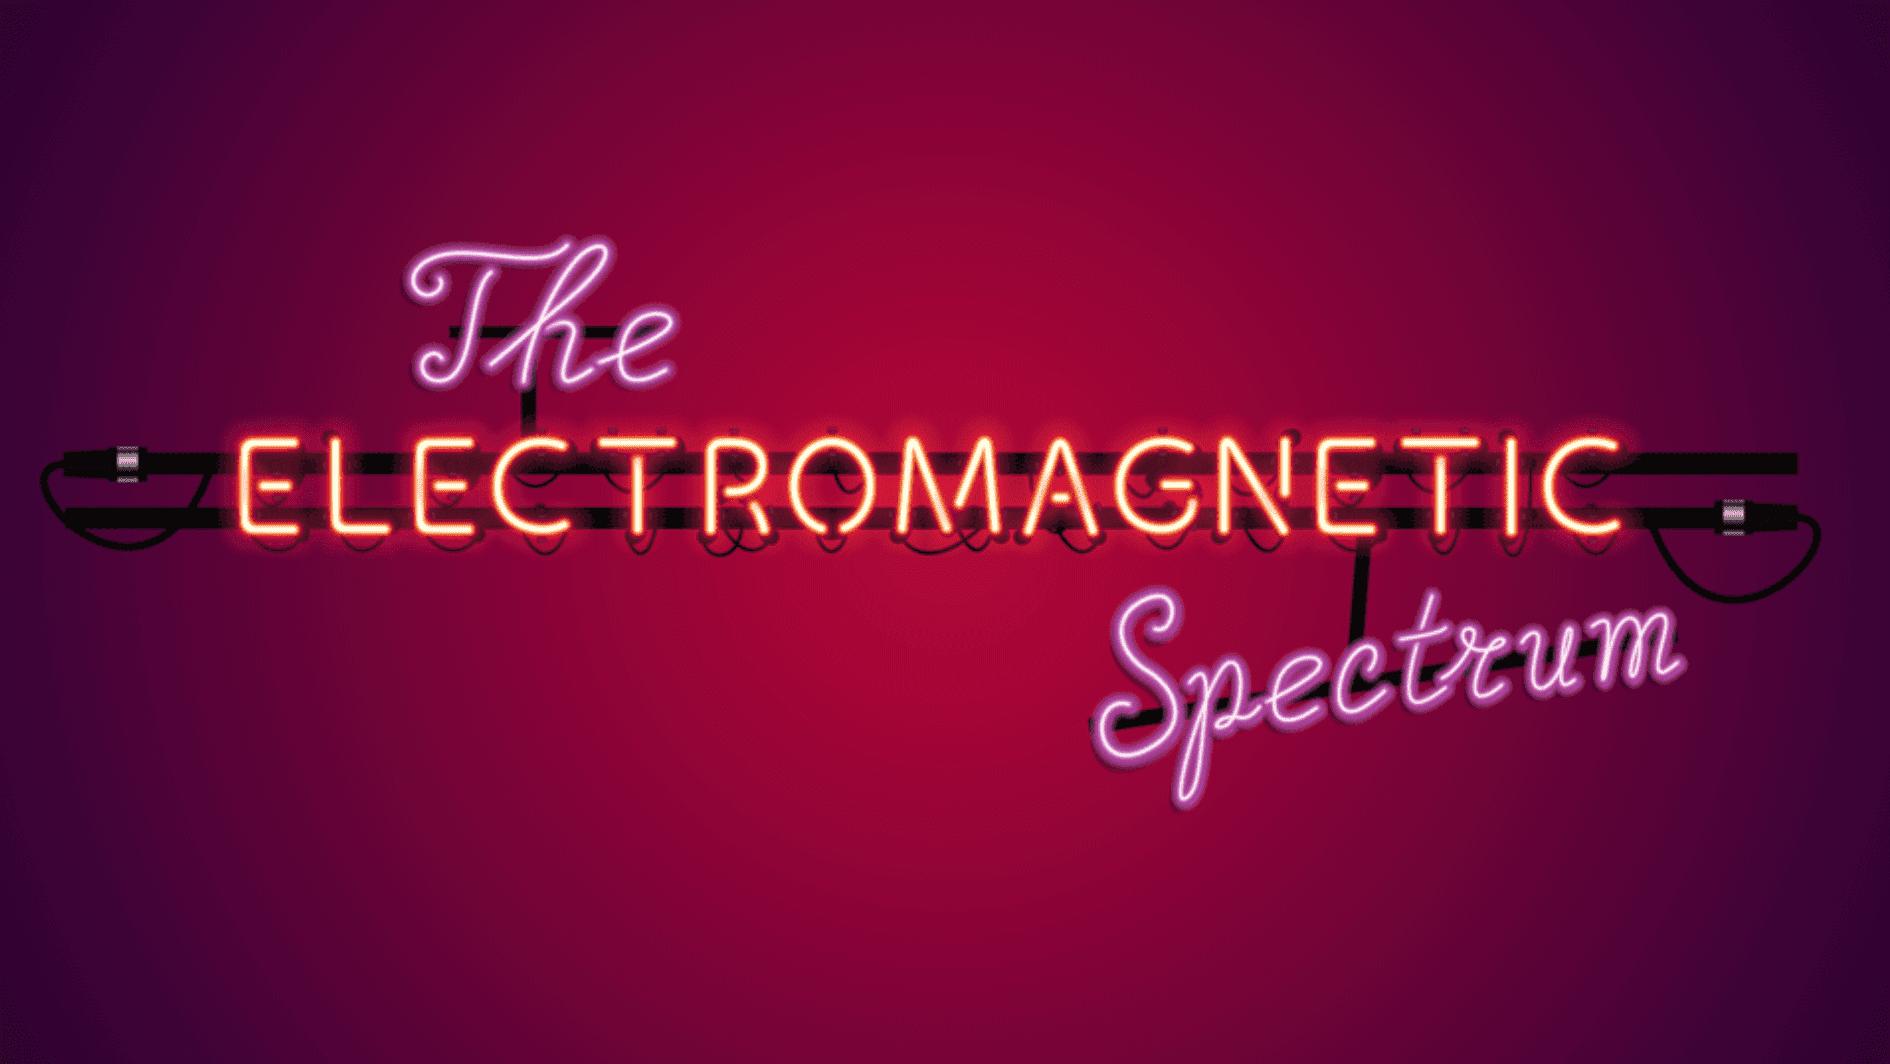 Year 9 - The Electromagnetic Spectrum Presentation